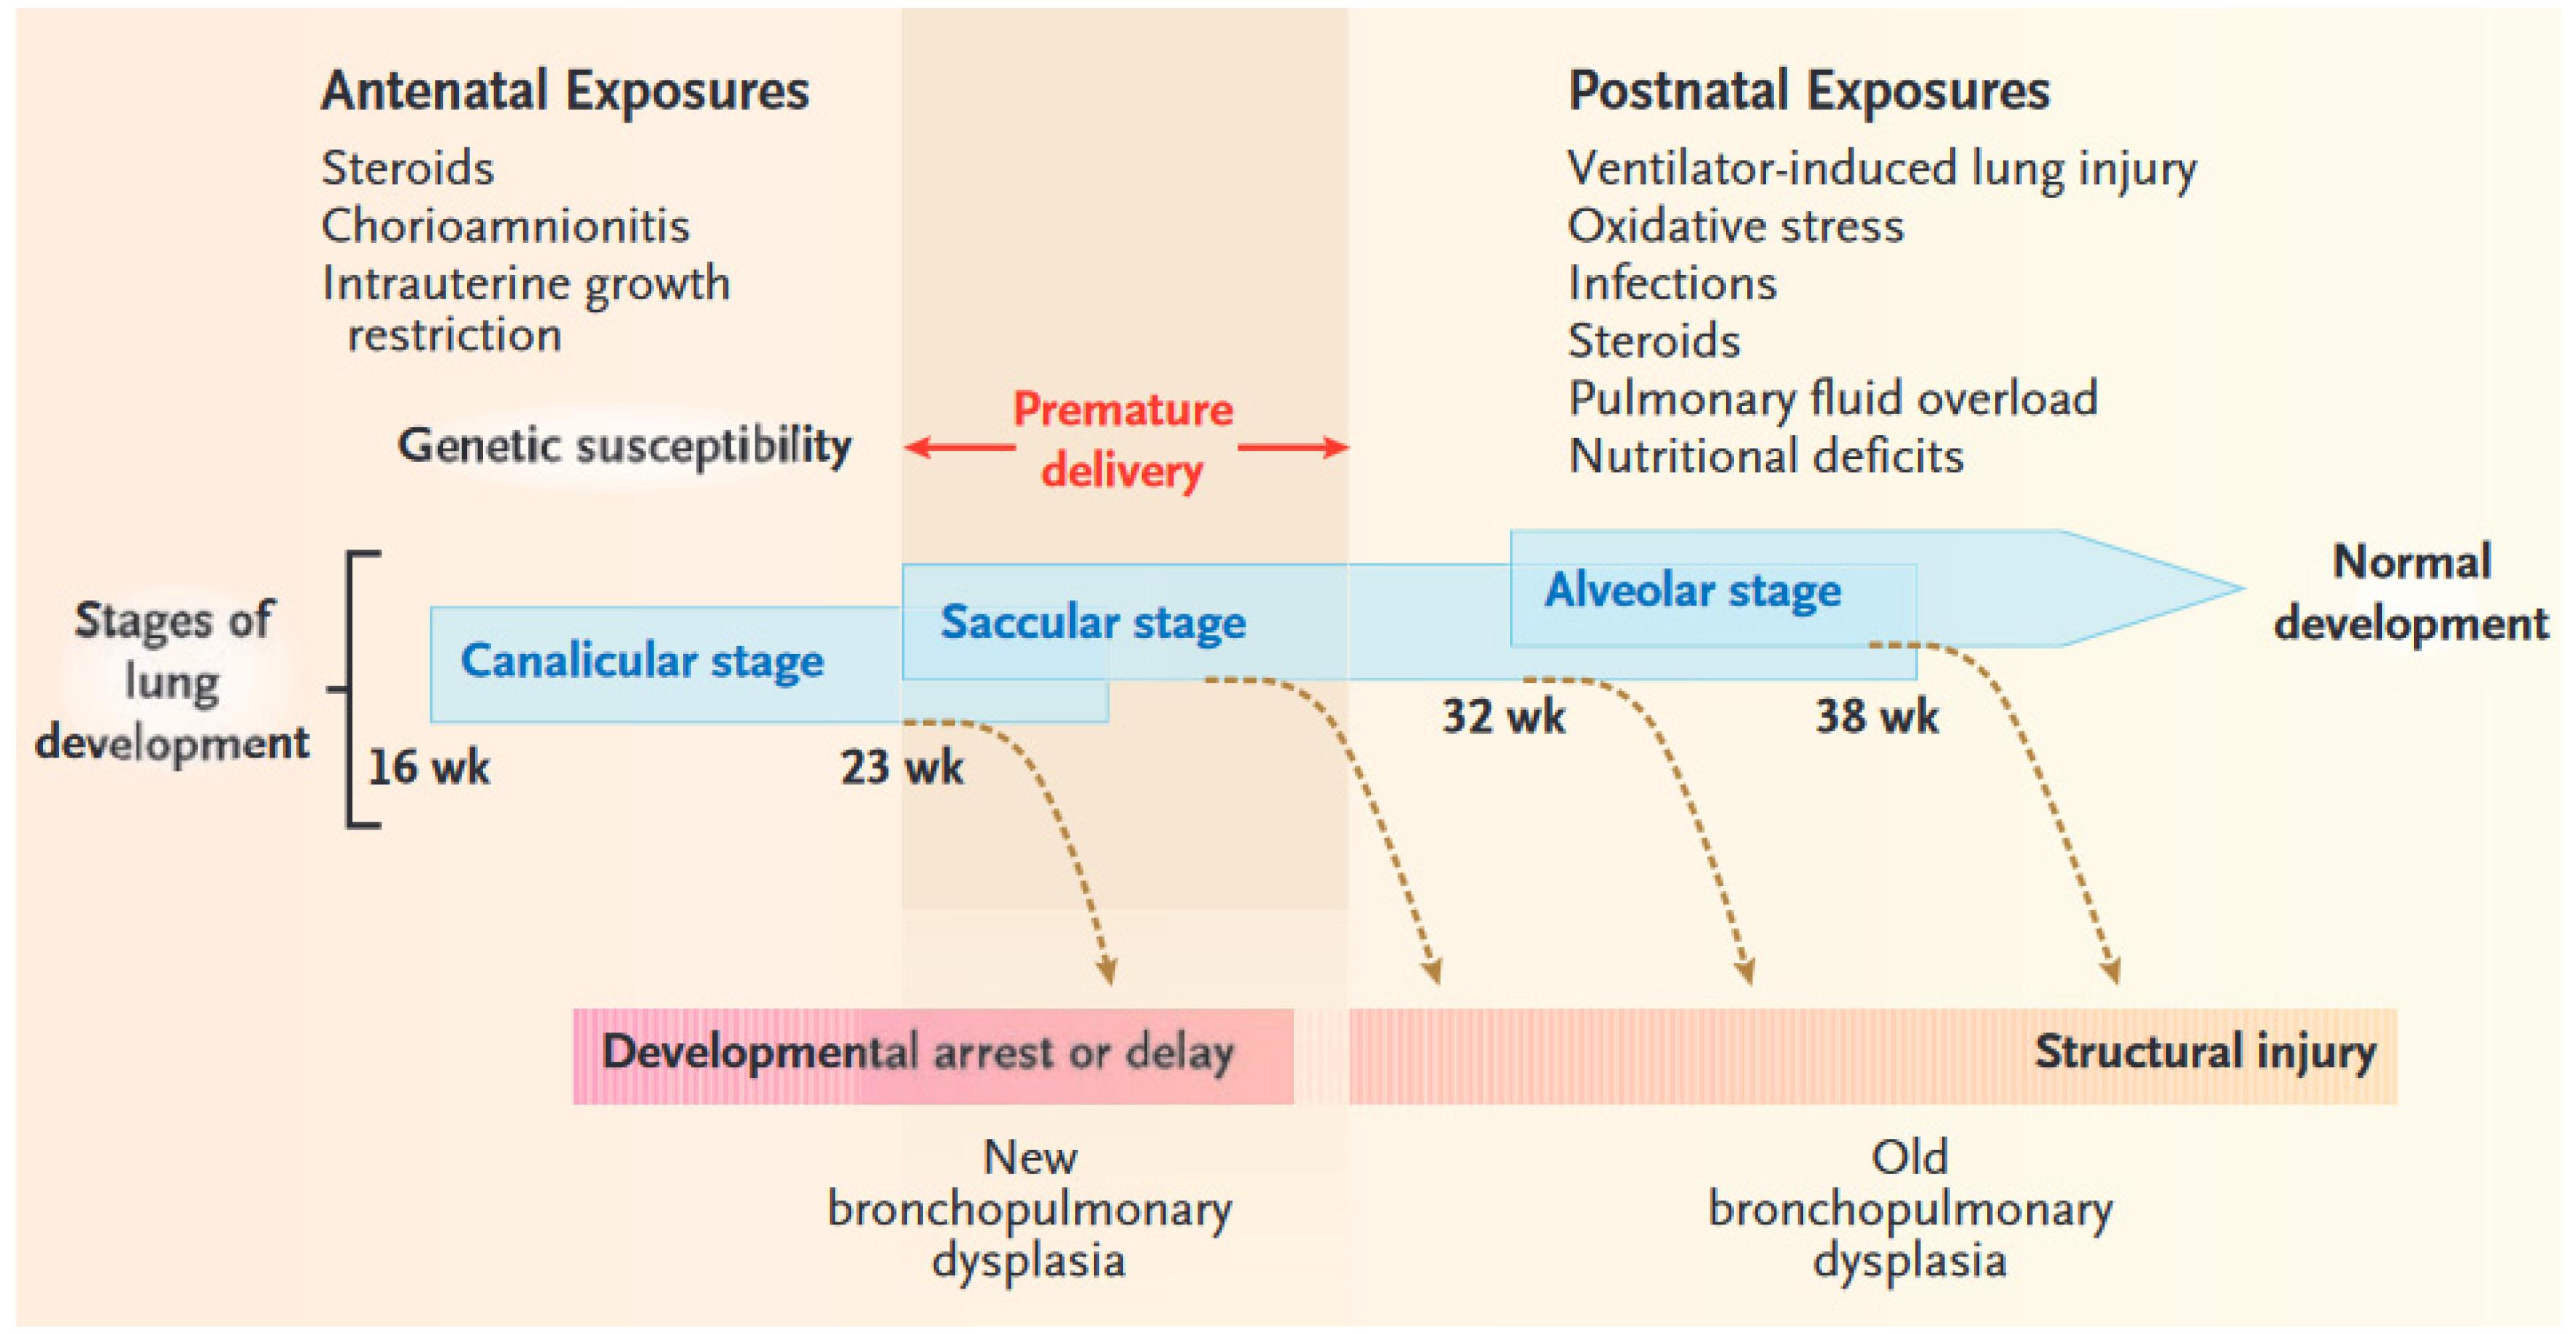 Featured Cases: Management Of Bronchopulmonary Dysplasia